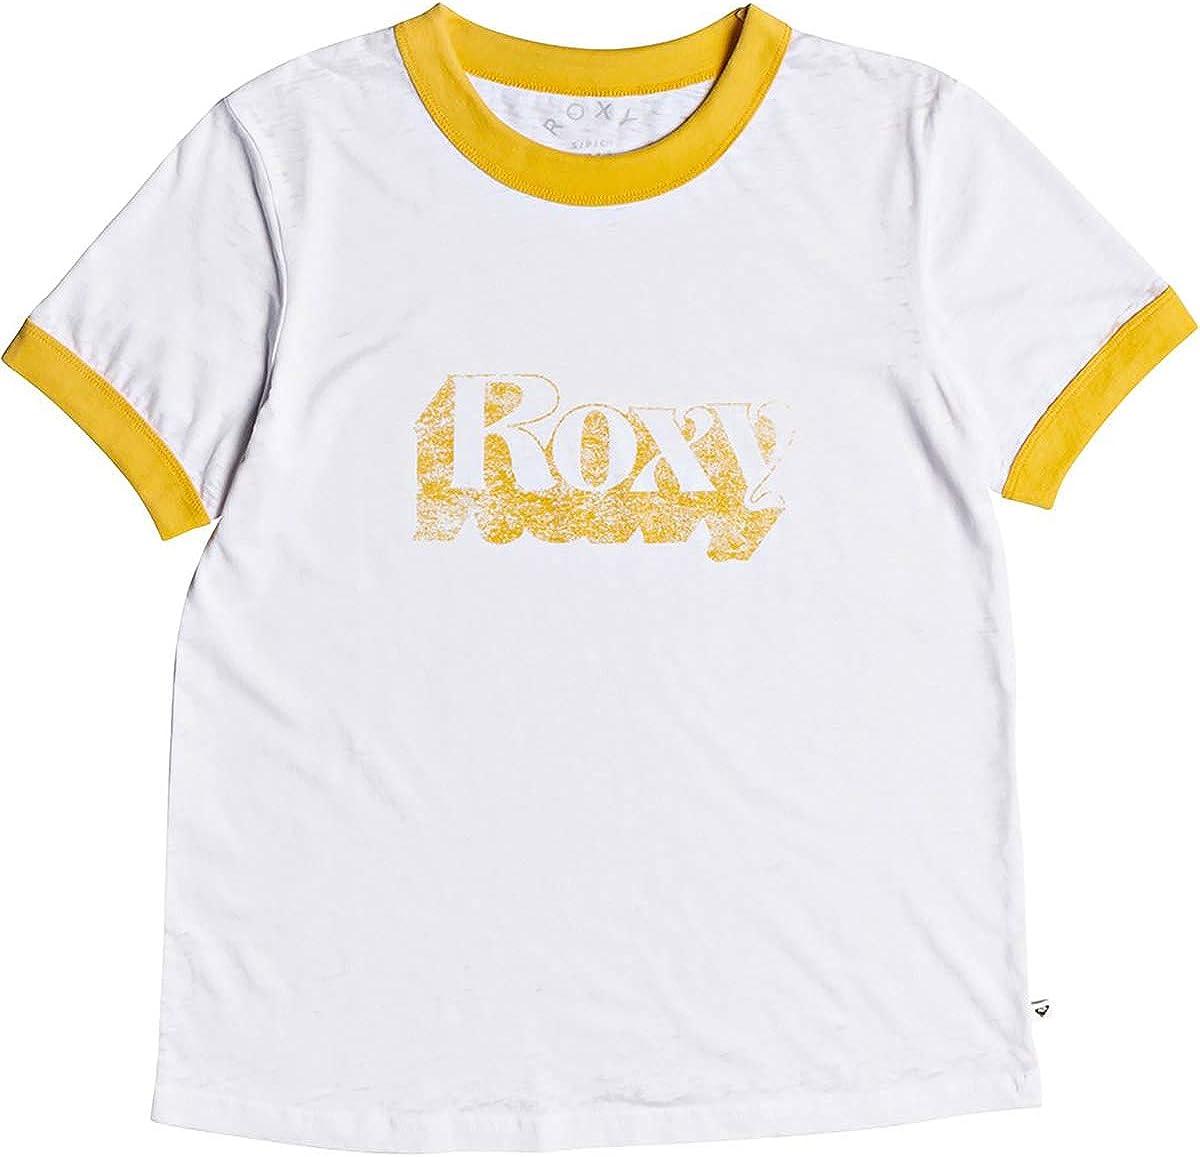 Roxy Women's Sand and Sun Rays Ringer T-Shirt